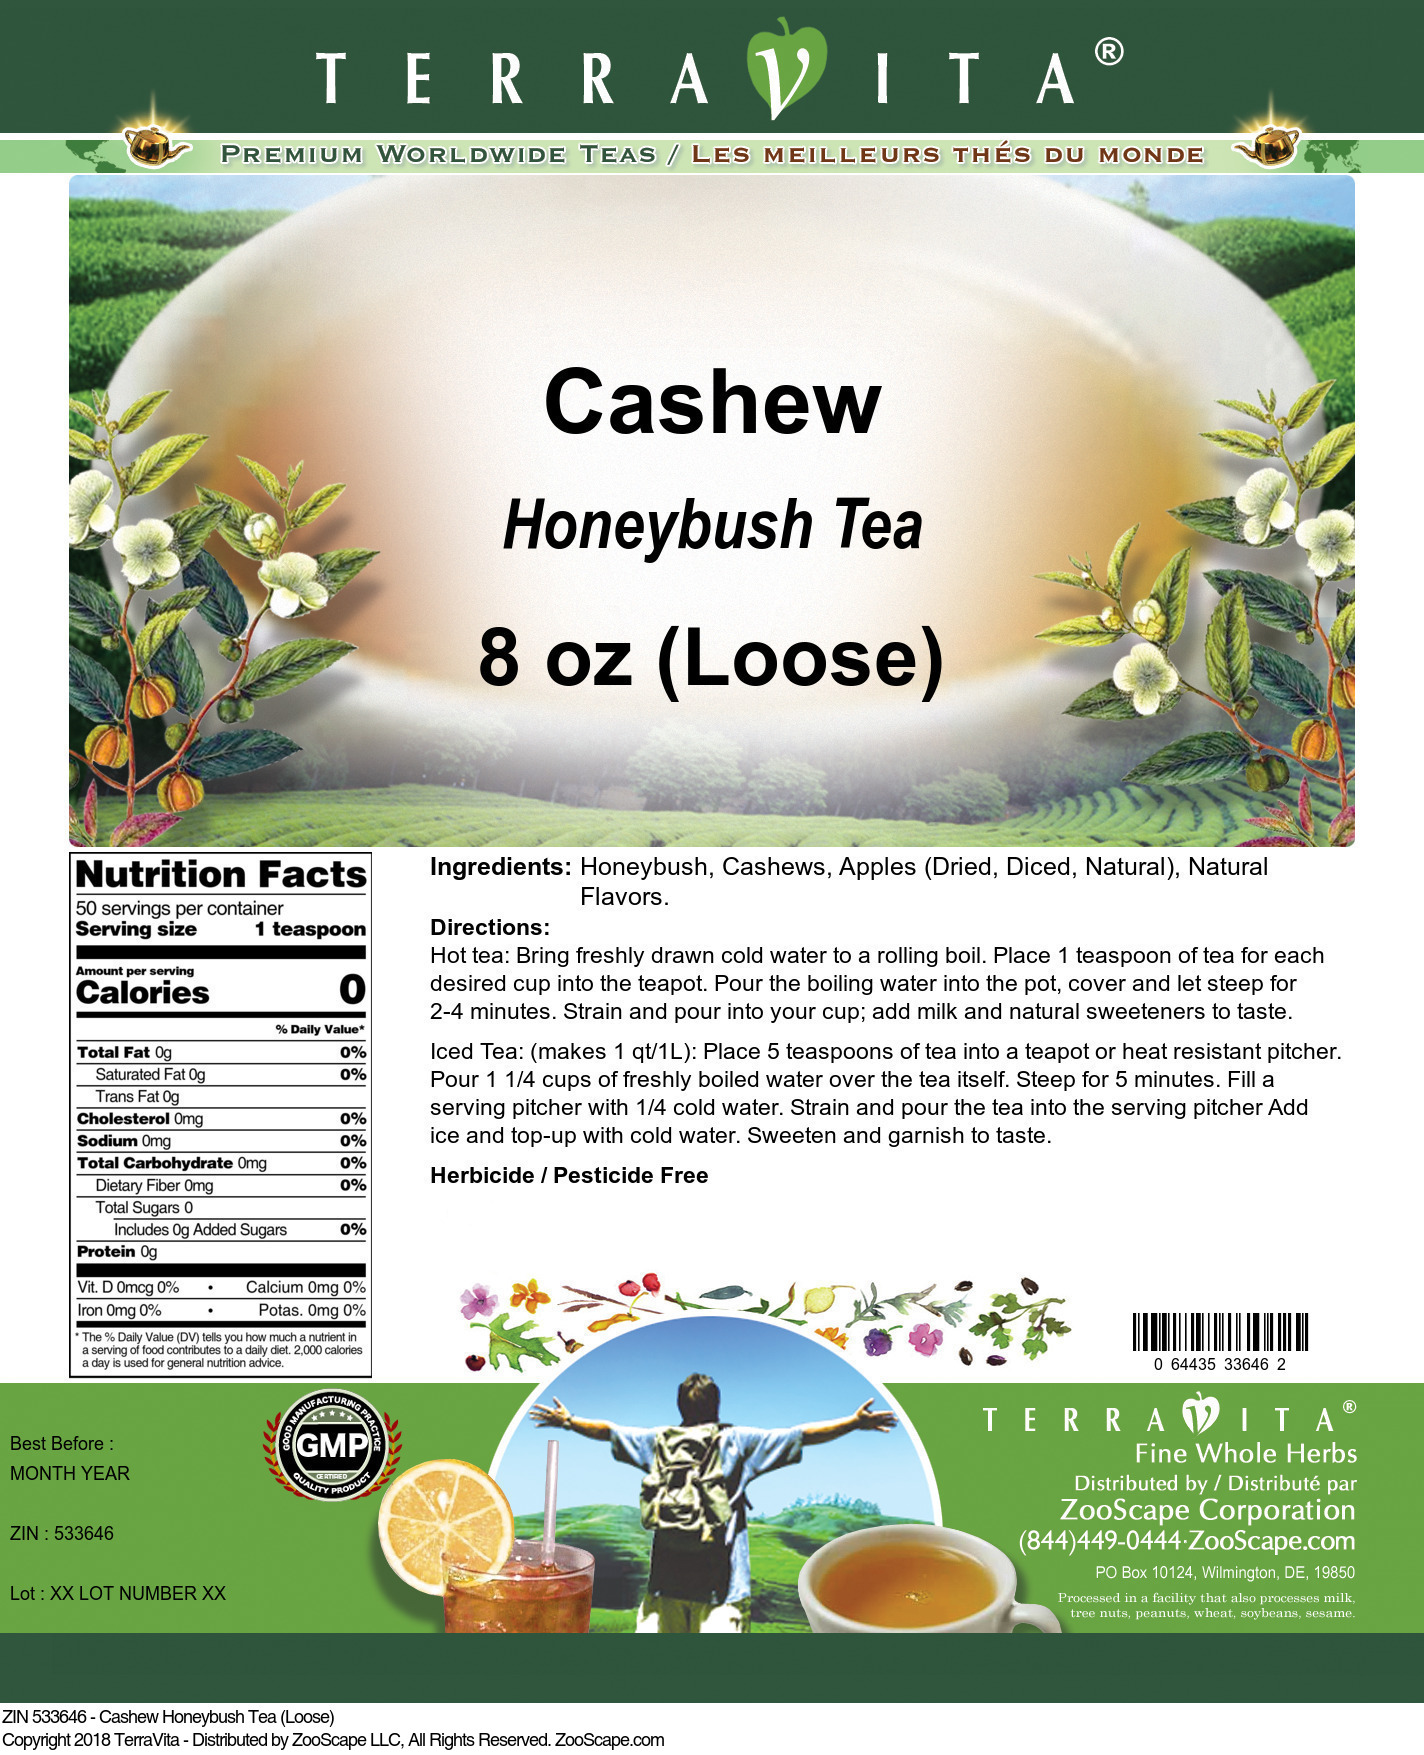 Cashew Honeybush Tea (Loose)